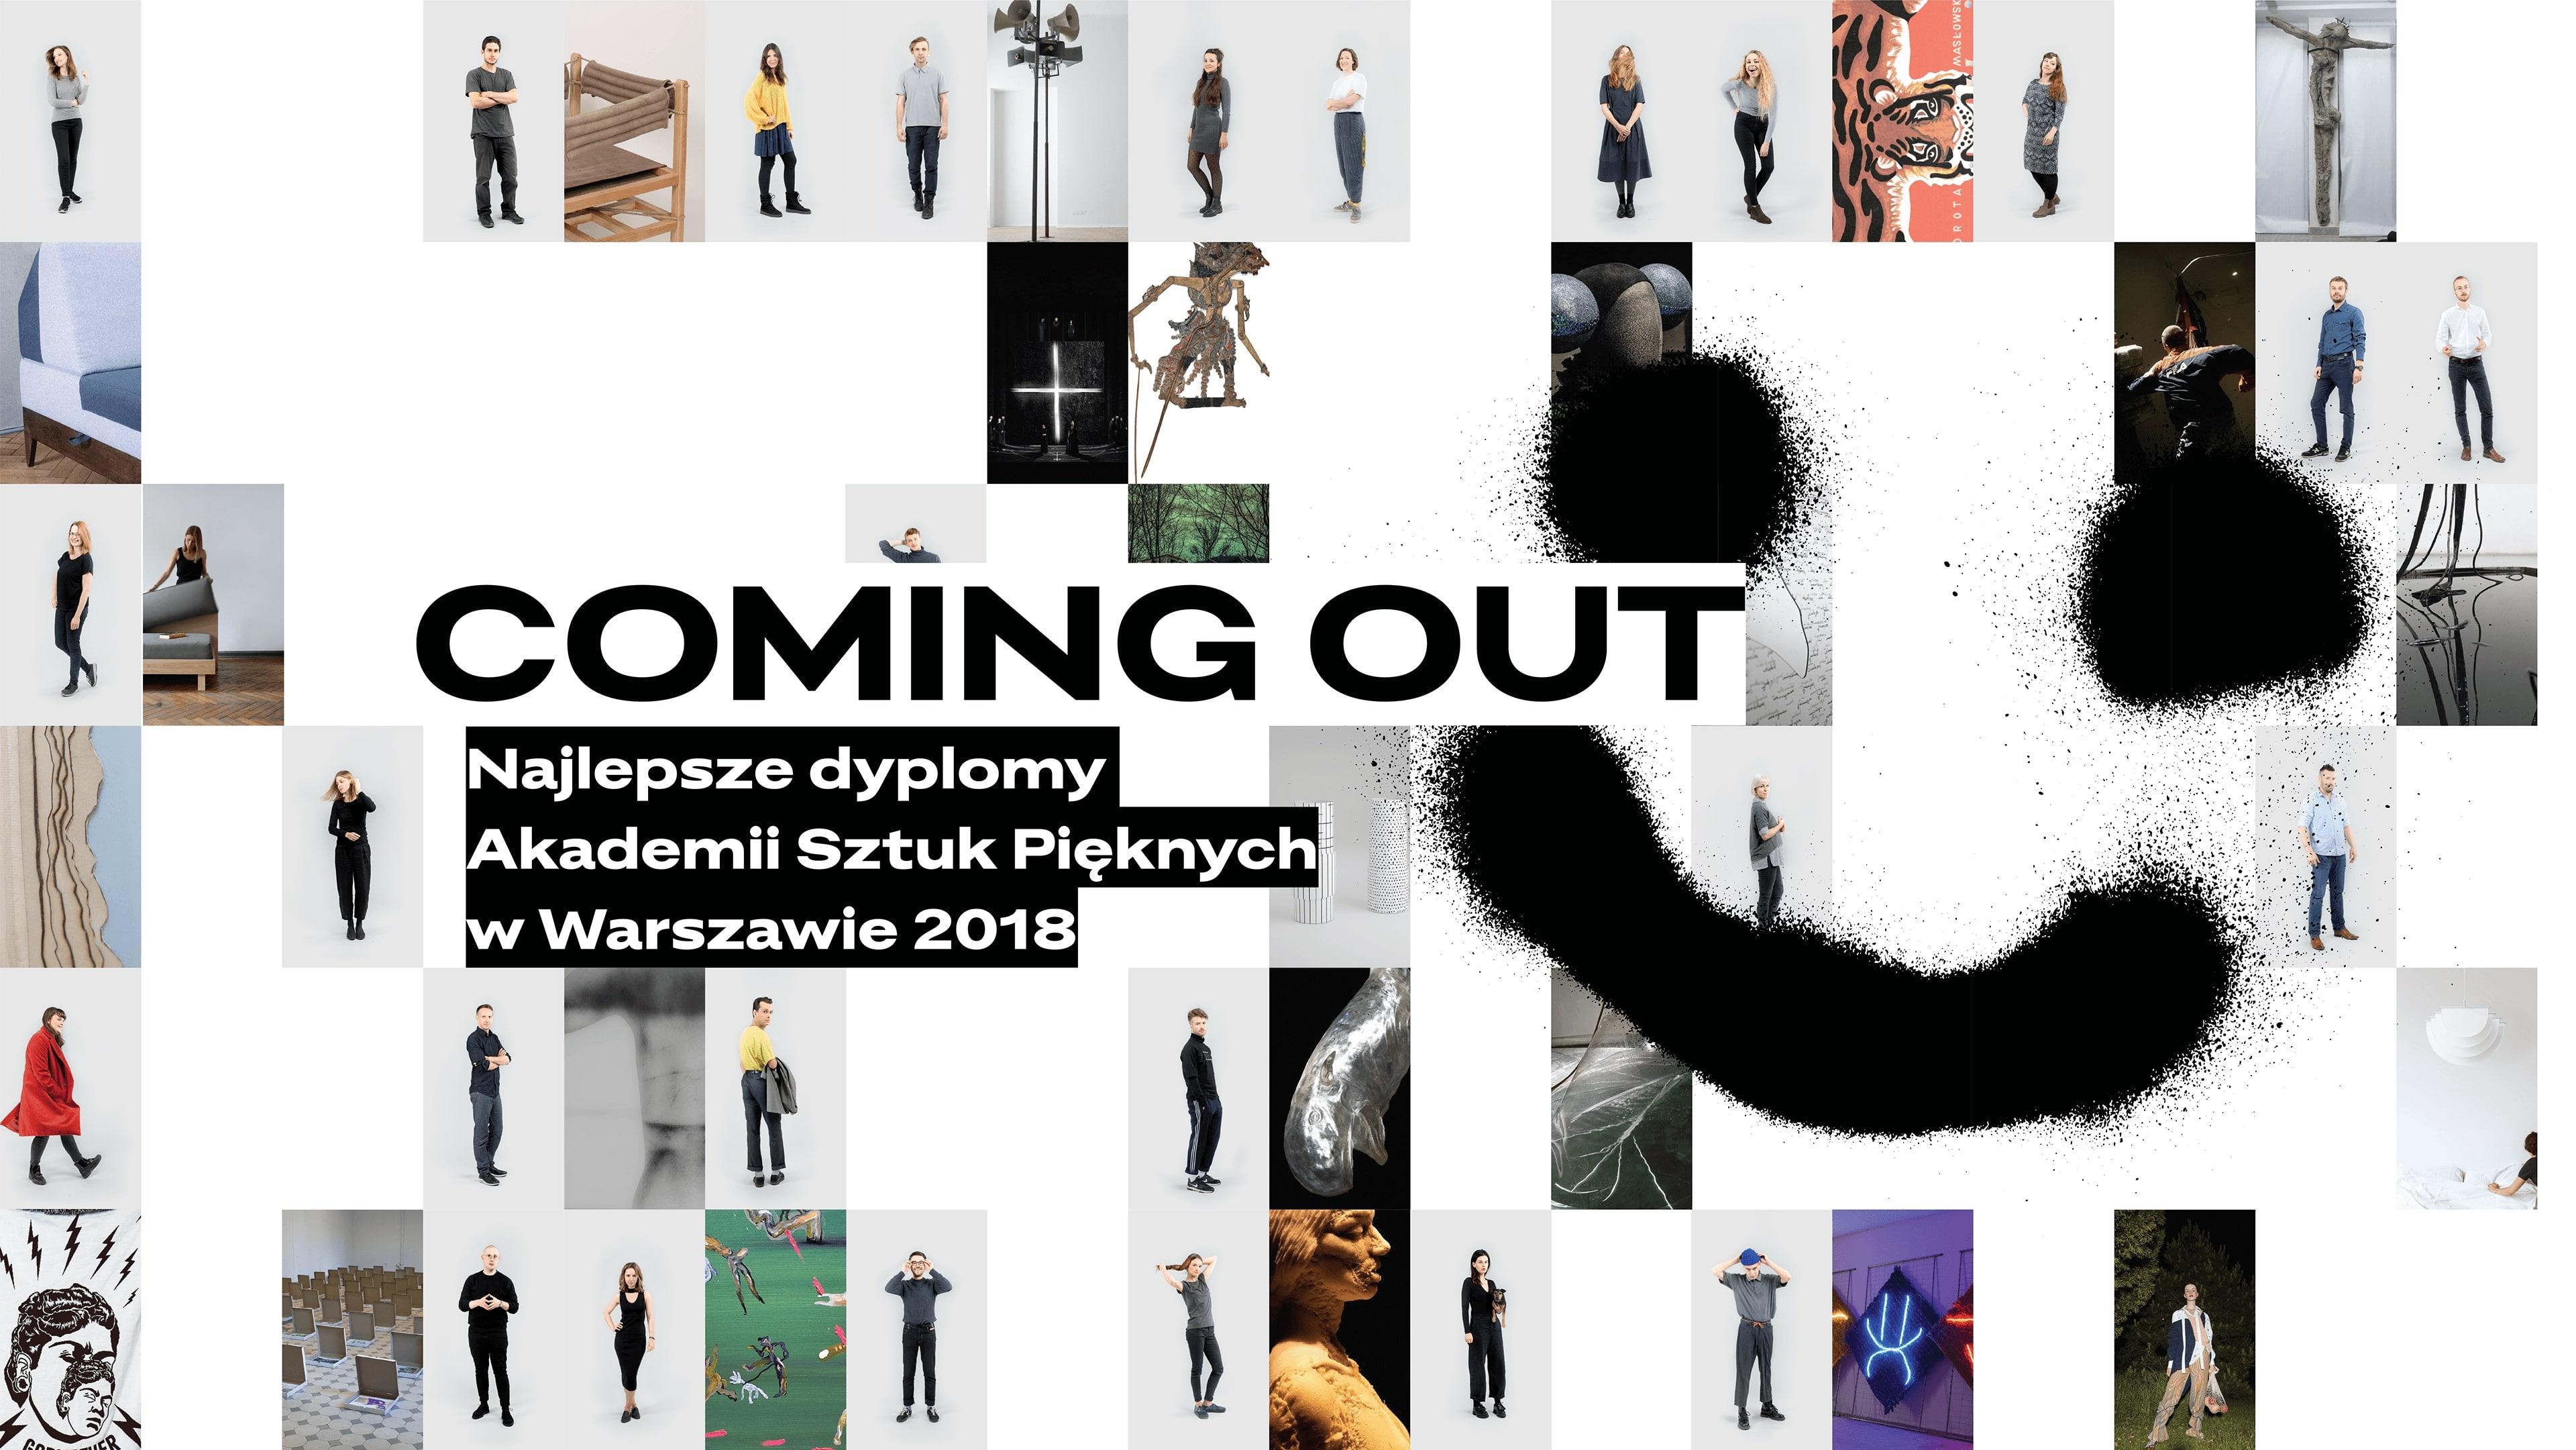 """Coming out 2018"" (źródło: materiały prasowe organizatora)"